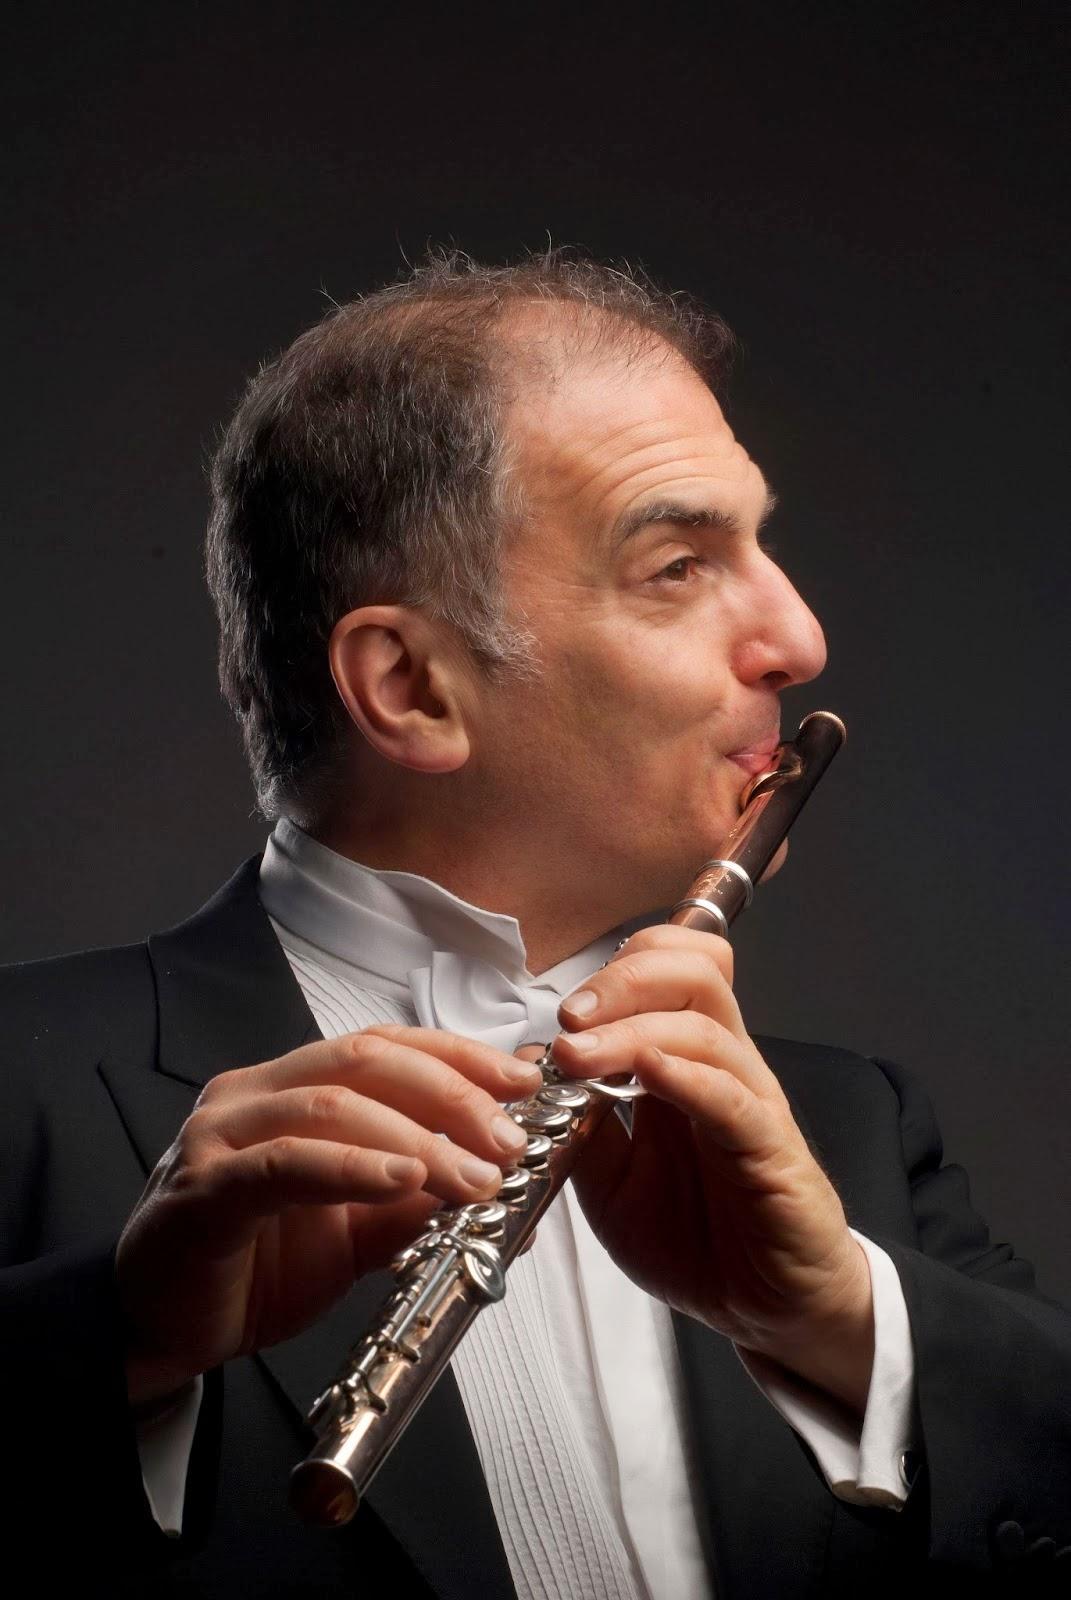 Frank Martin, Ballade for Flute and Piano. Flautista Claudio Barile - Claudio%2BBarile%2B-%2BA